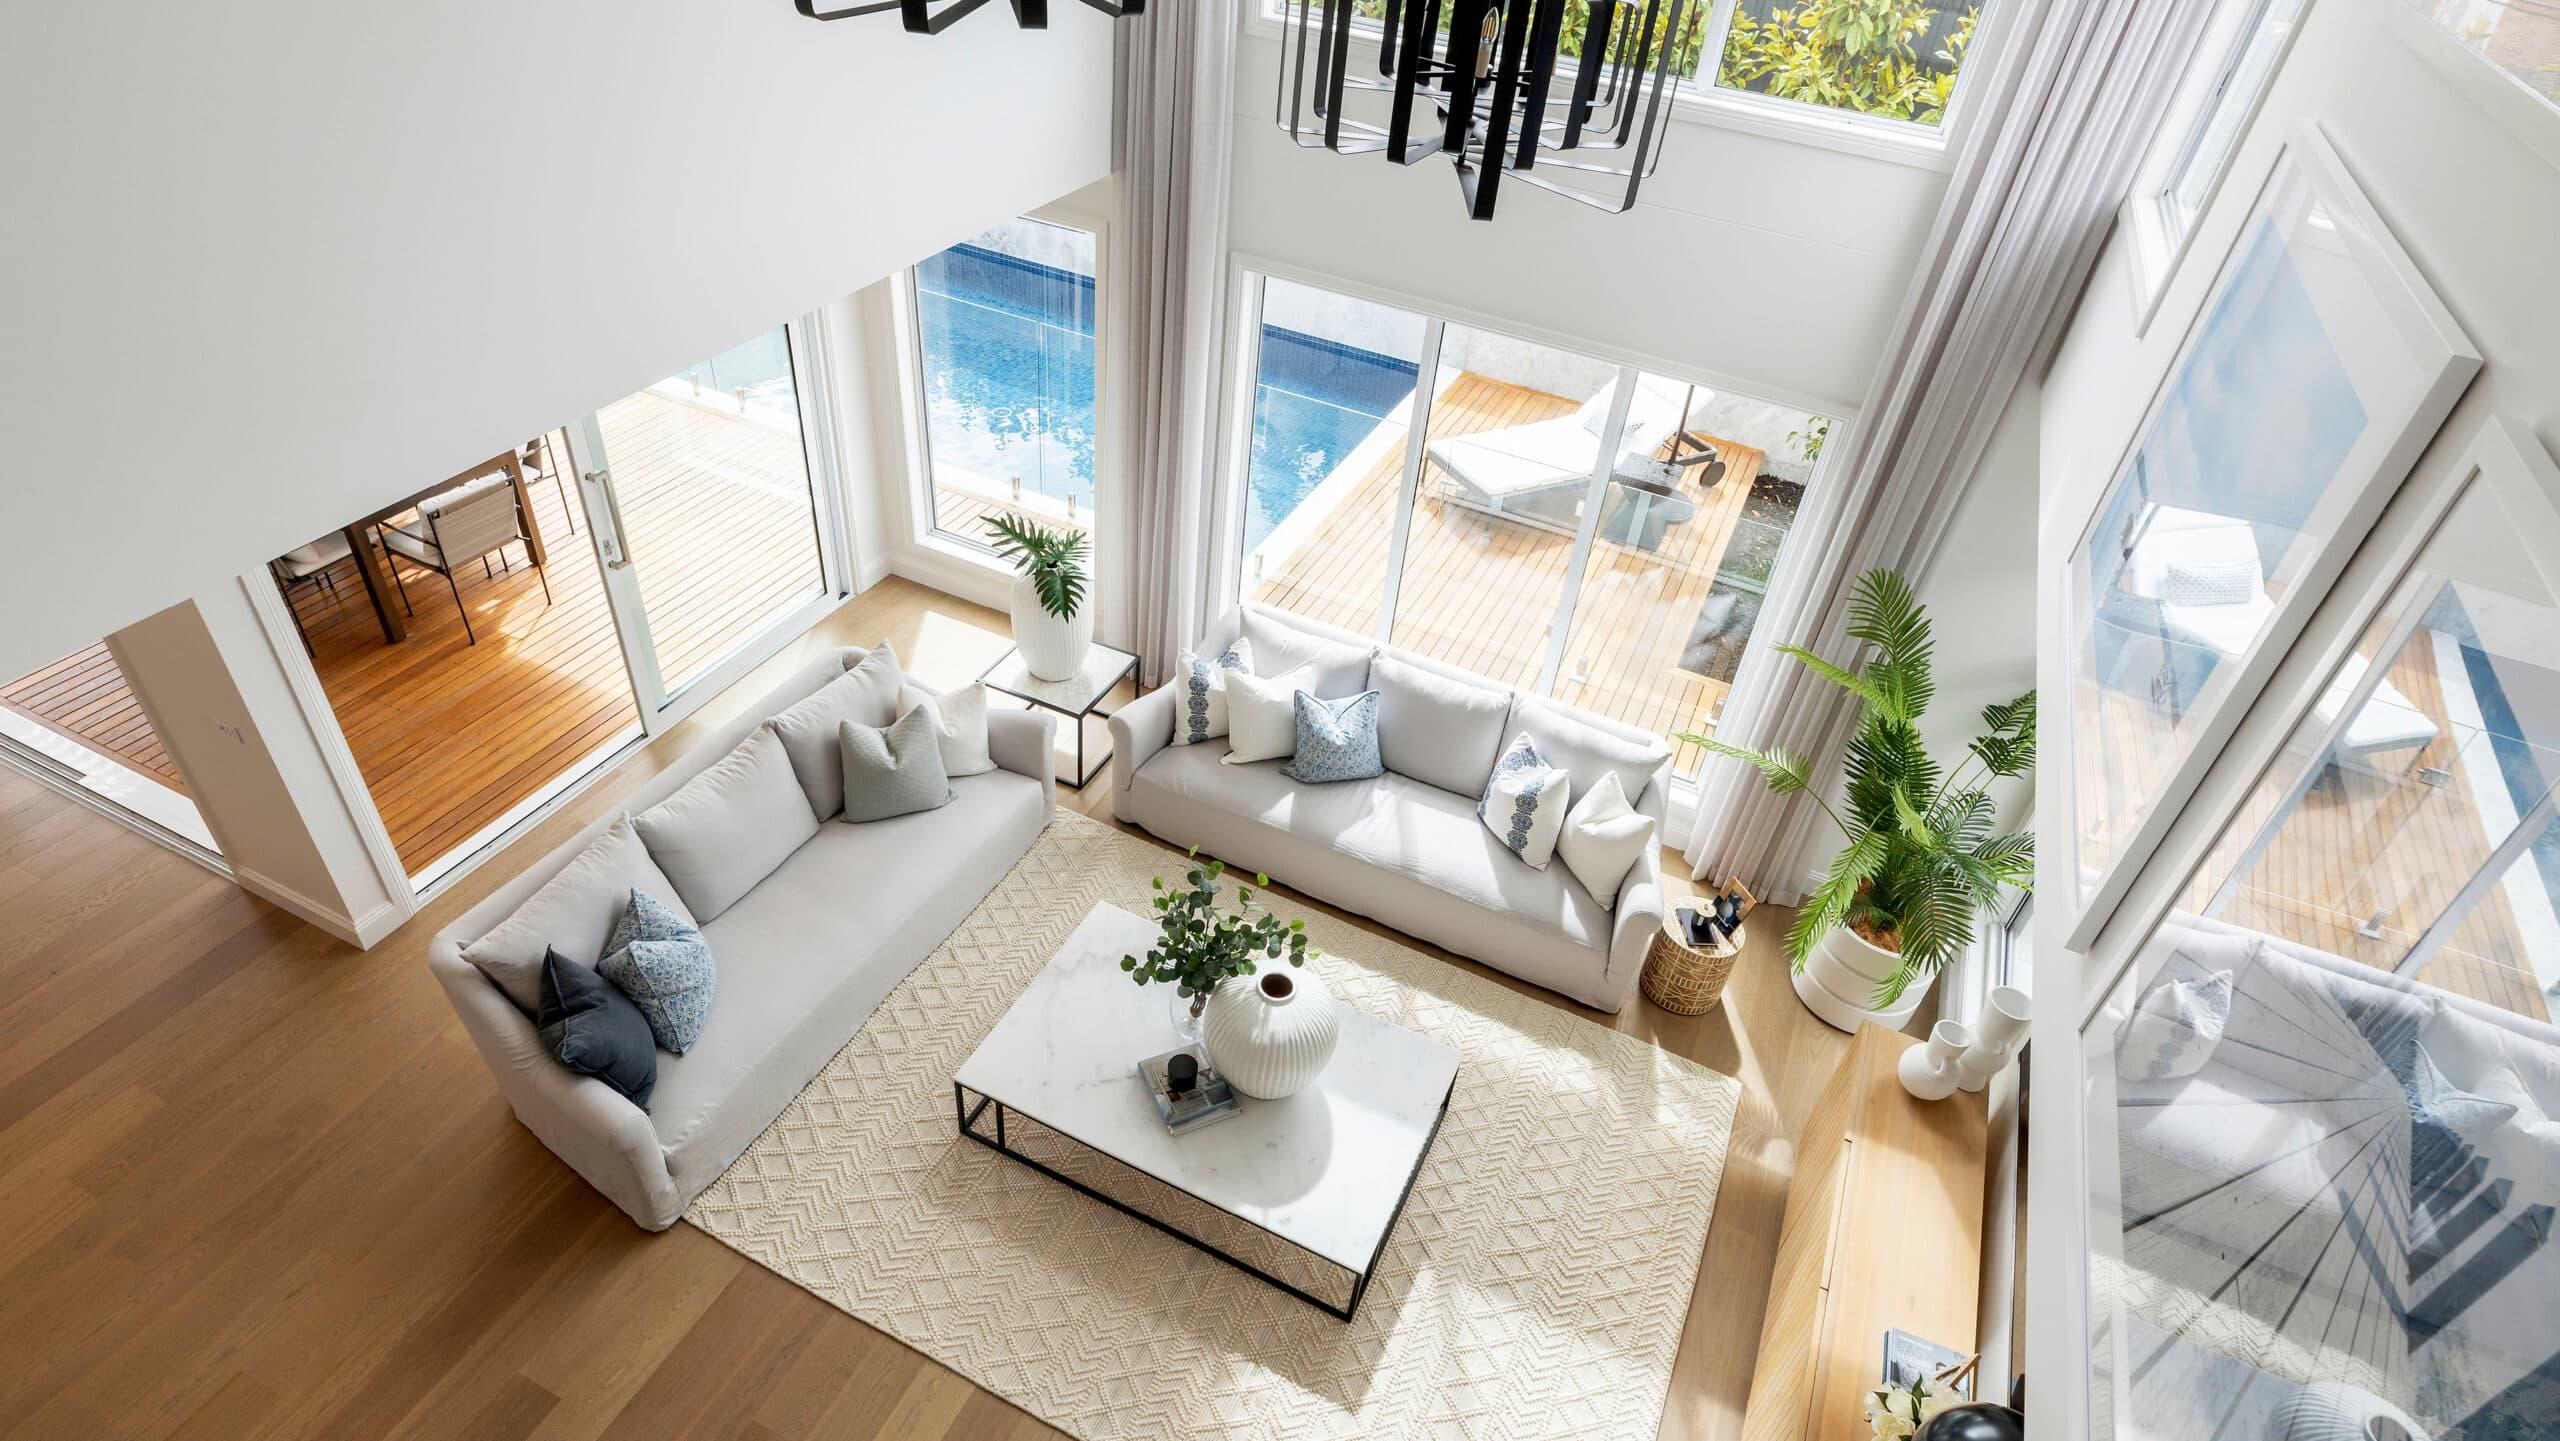 forest_hill_display_home_contempoary_bridgehampton_world_of_style_plaza_grange_5025